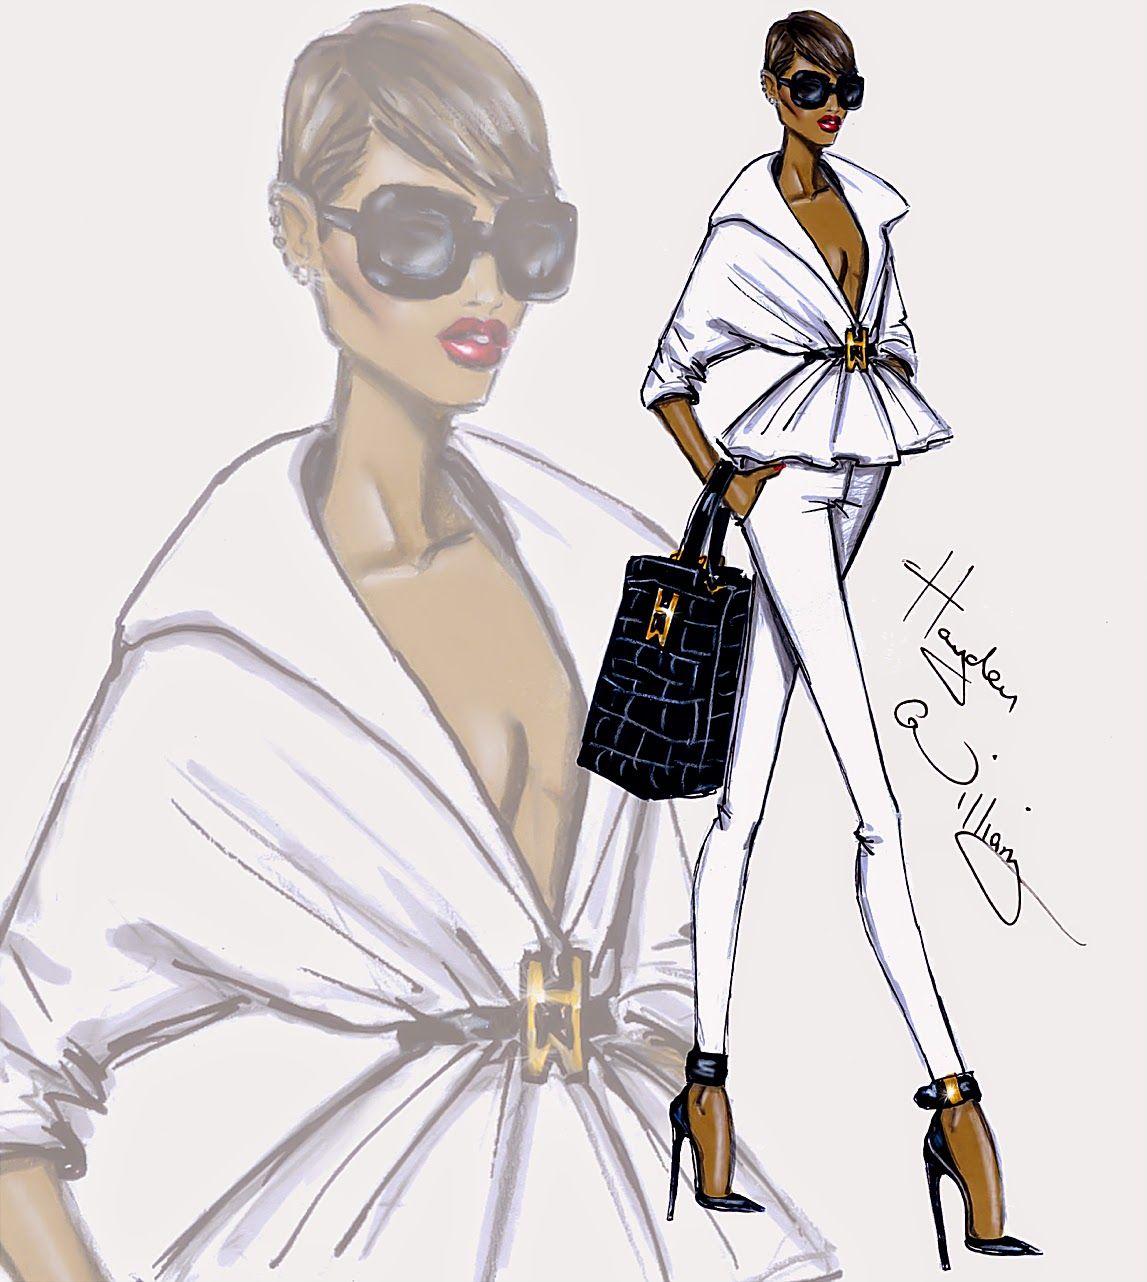 Fashion sketches new fashion sketches - Hayden_williams Fashion Illustrations New Attitude